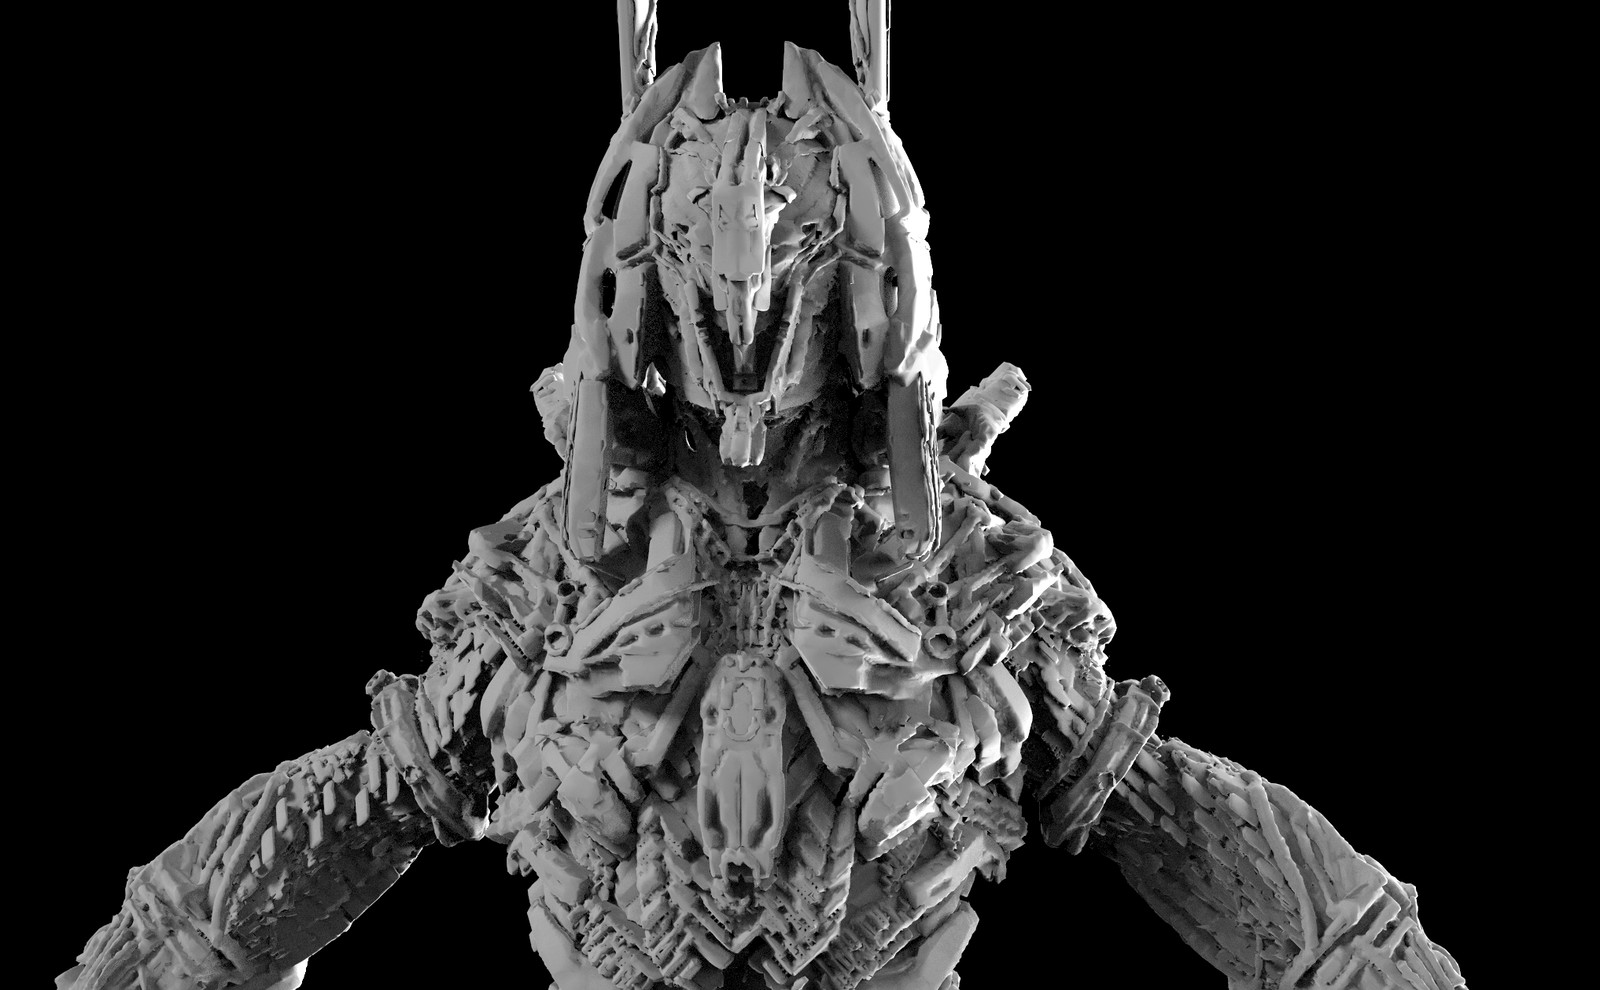 Mech Anubis 3D Coat sketch concept